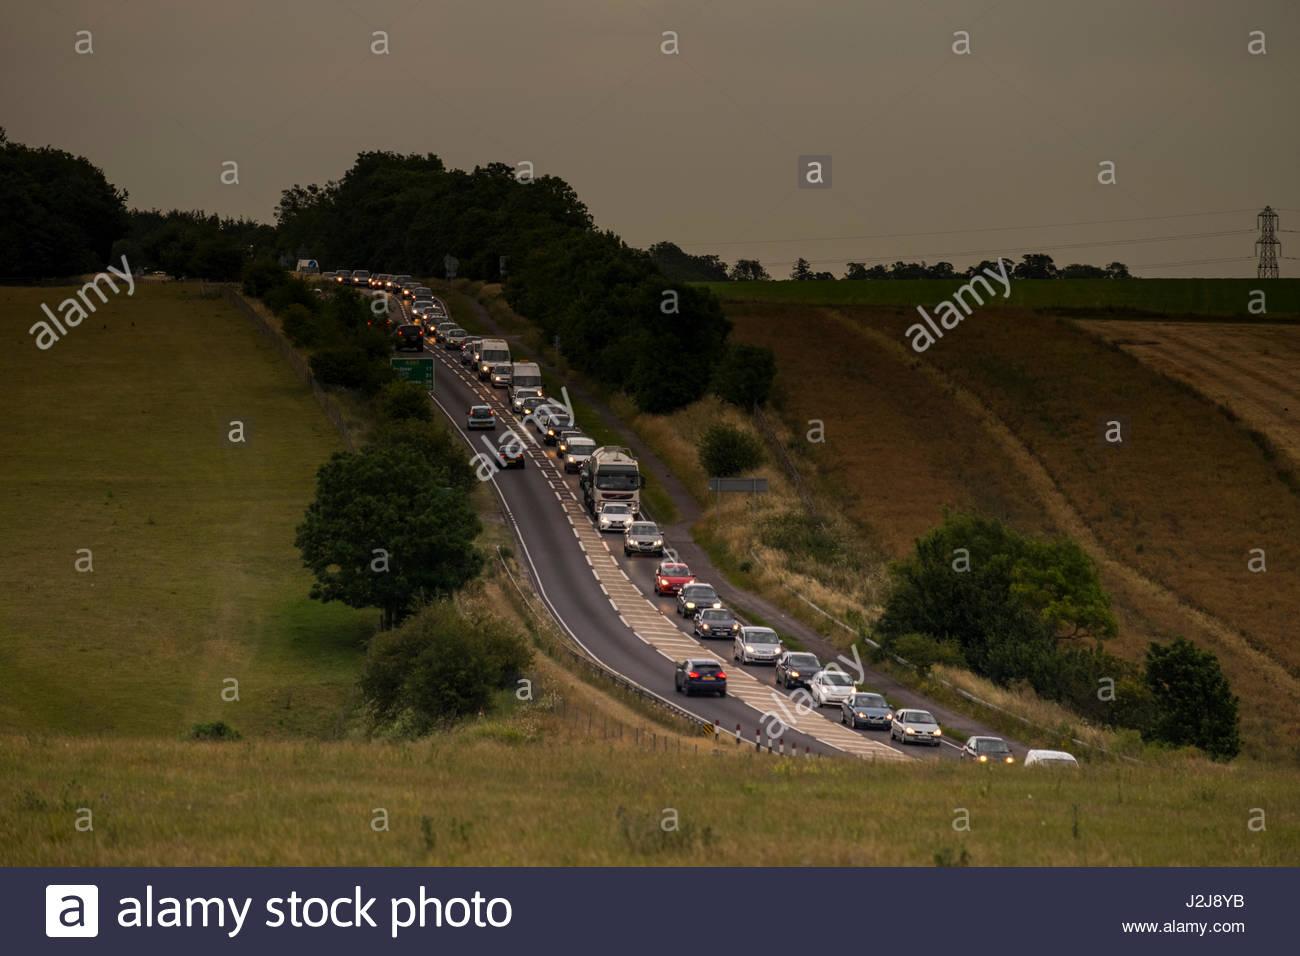 Automobile traffic on A303, Wiltshire, England, United Kingdom - Stock Image